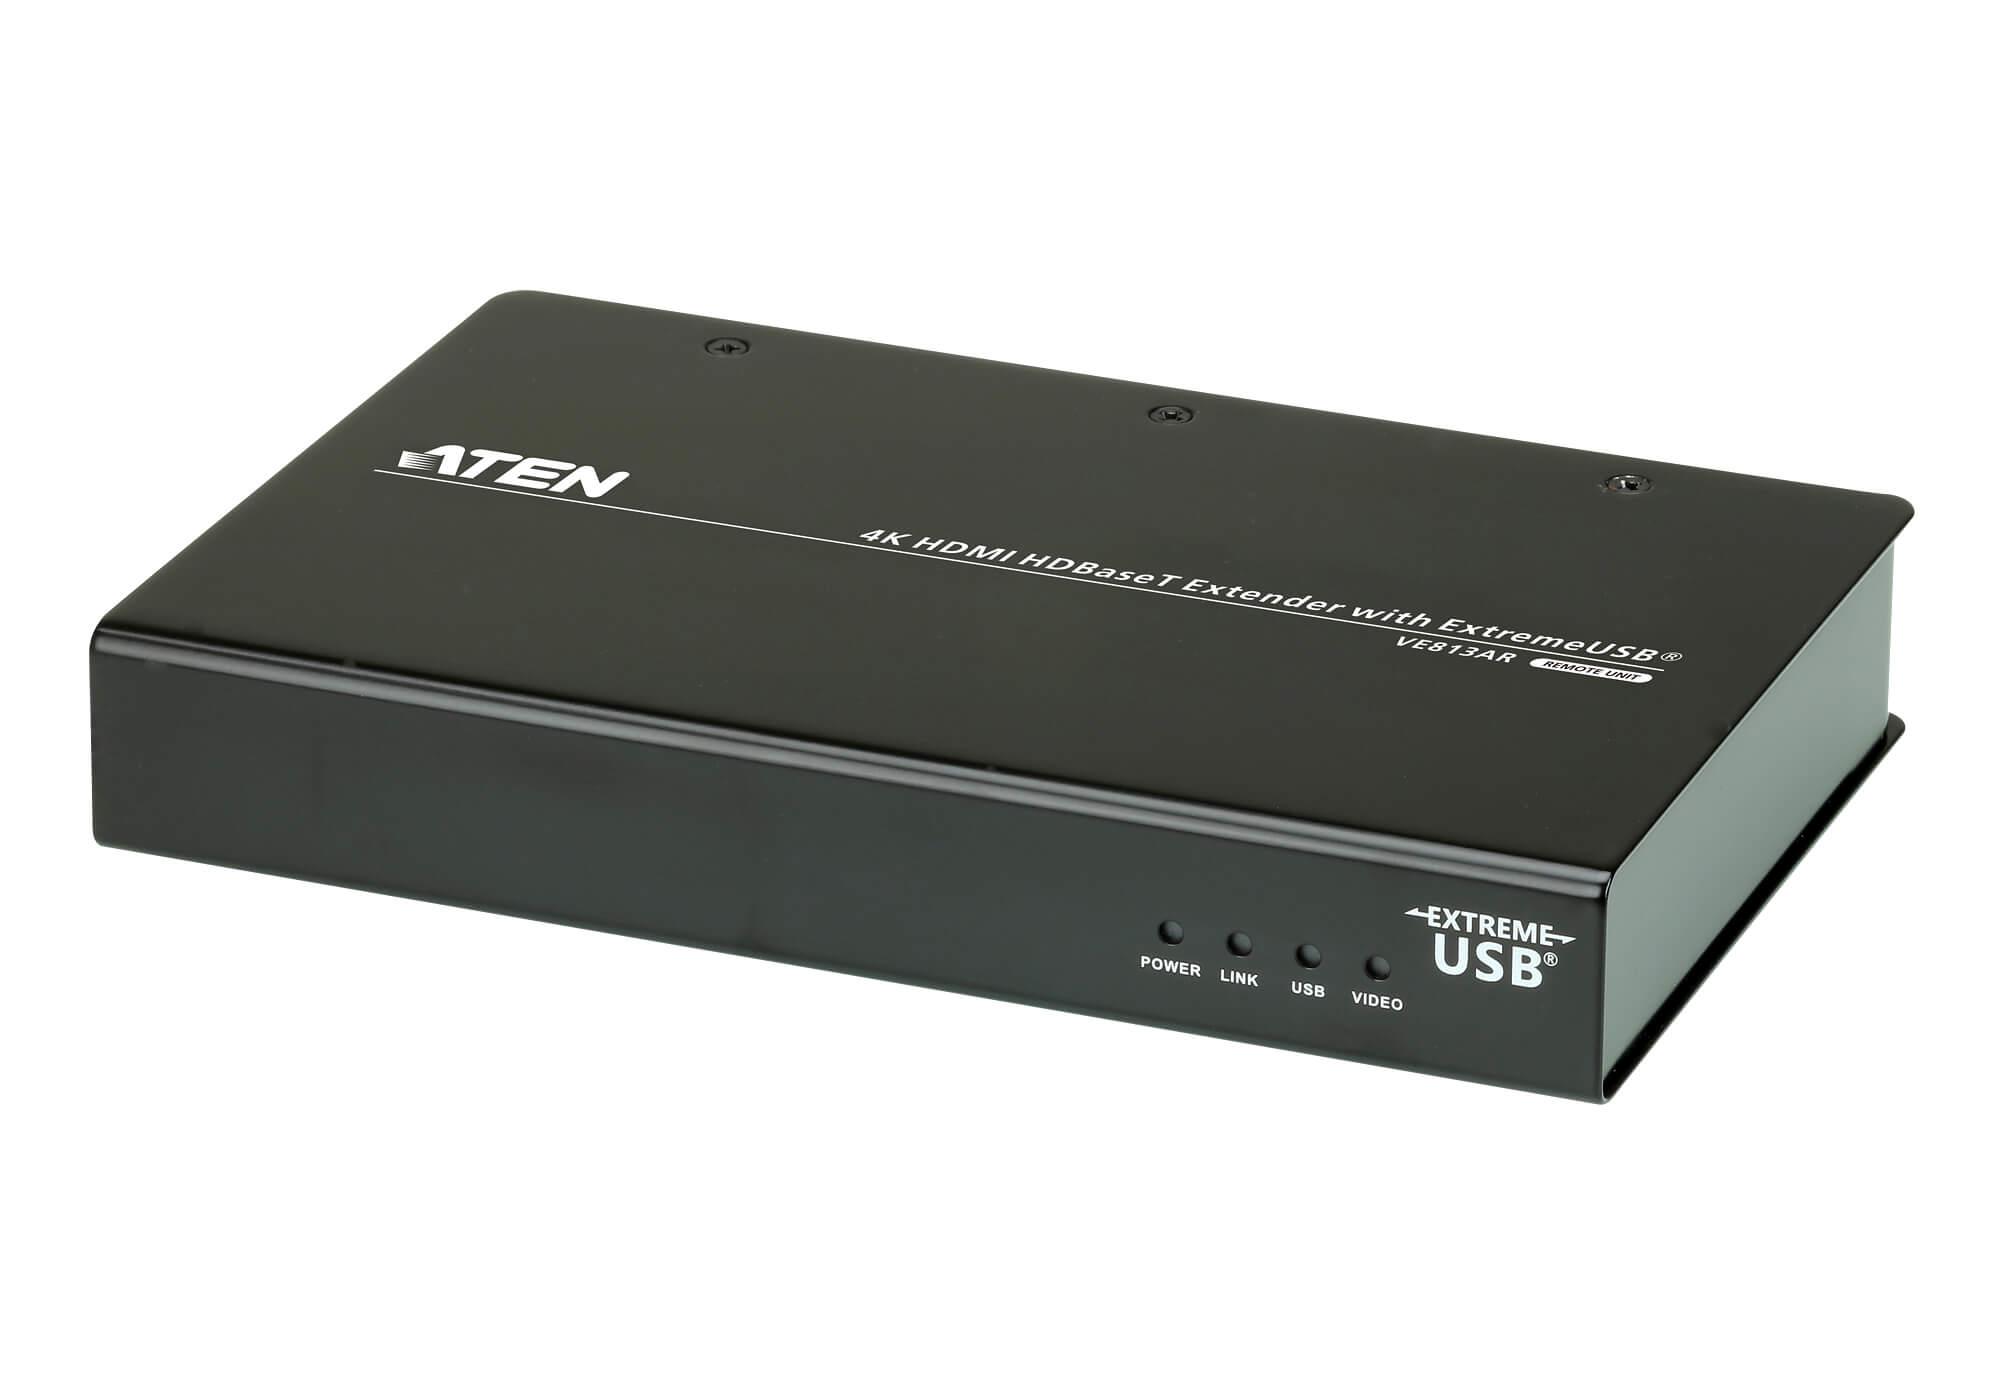 HDMIツイストペアケーブルエクステンダー(4K USB対応)-5